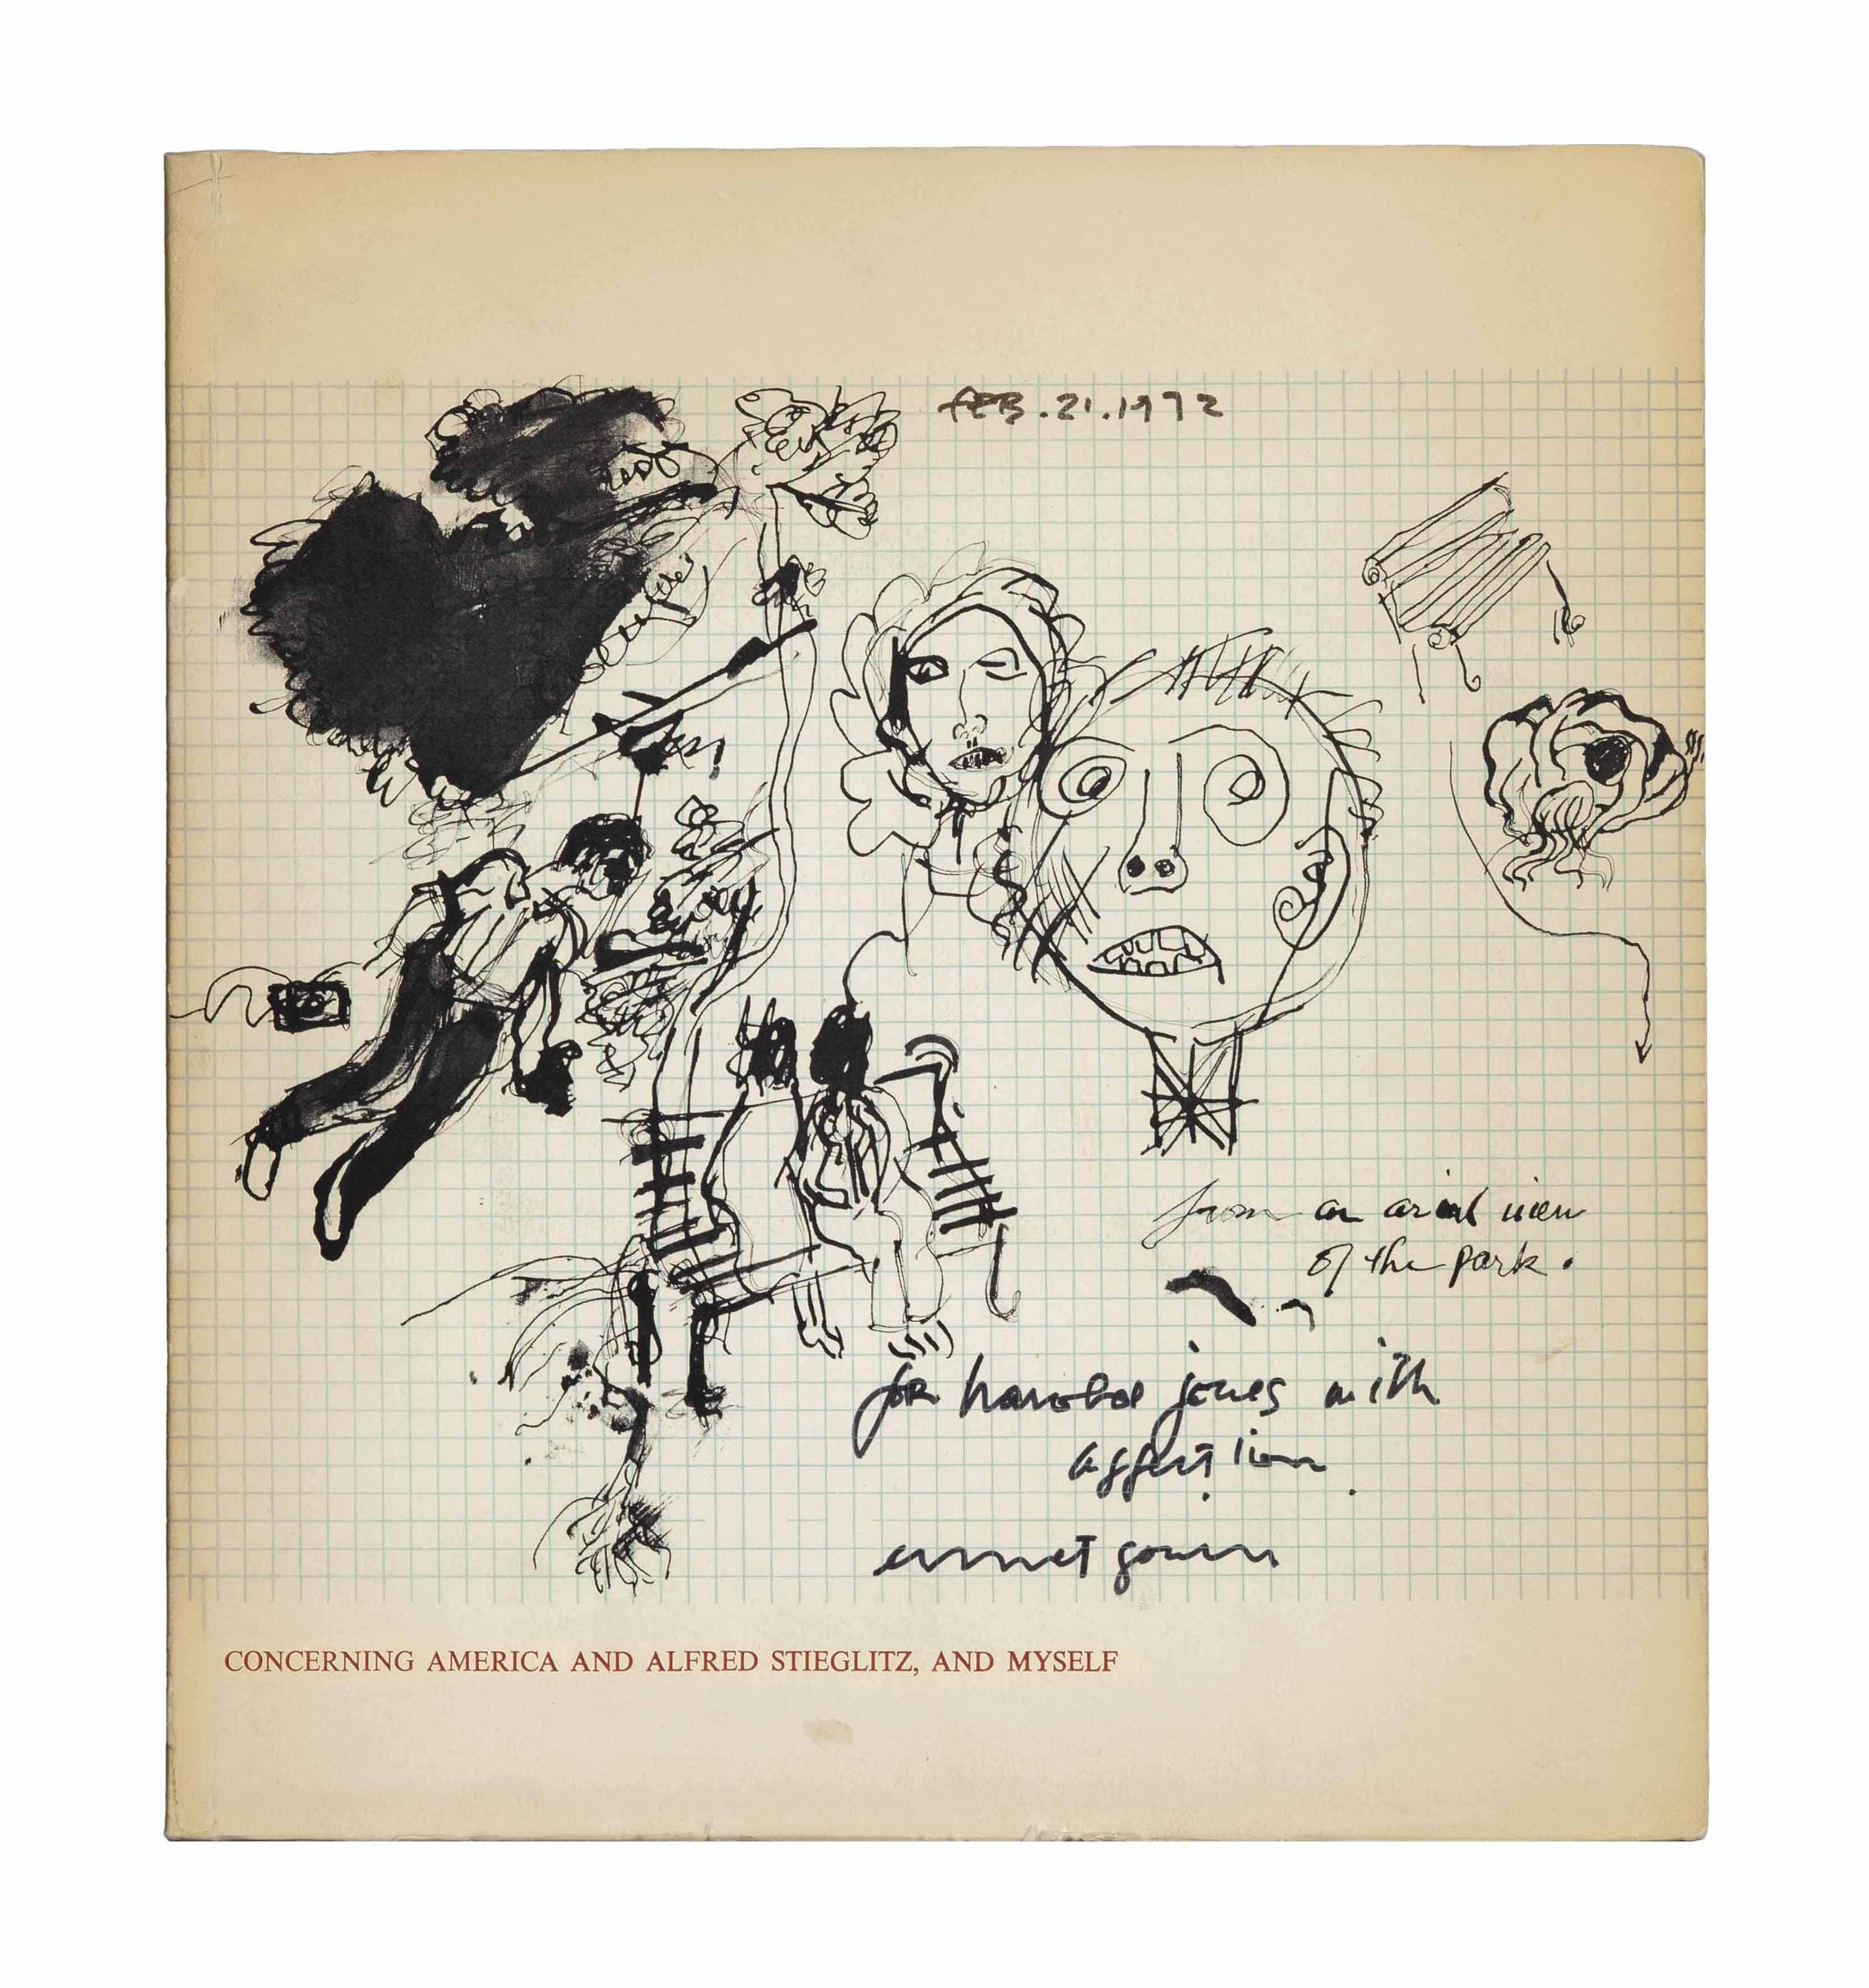 'Concerning America and Alfred Stieglitz, and Myself'